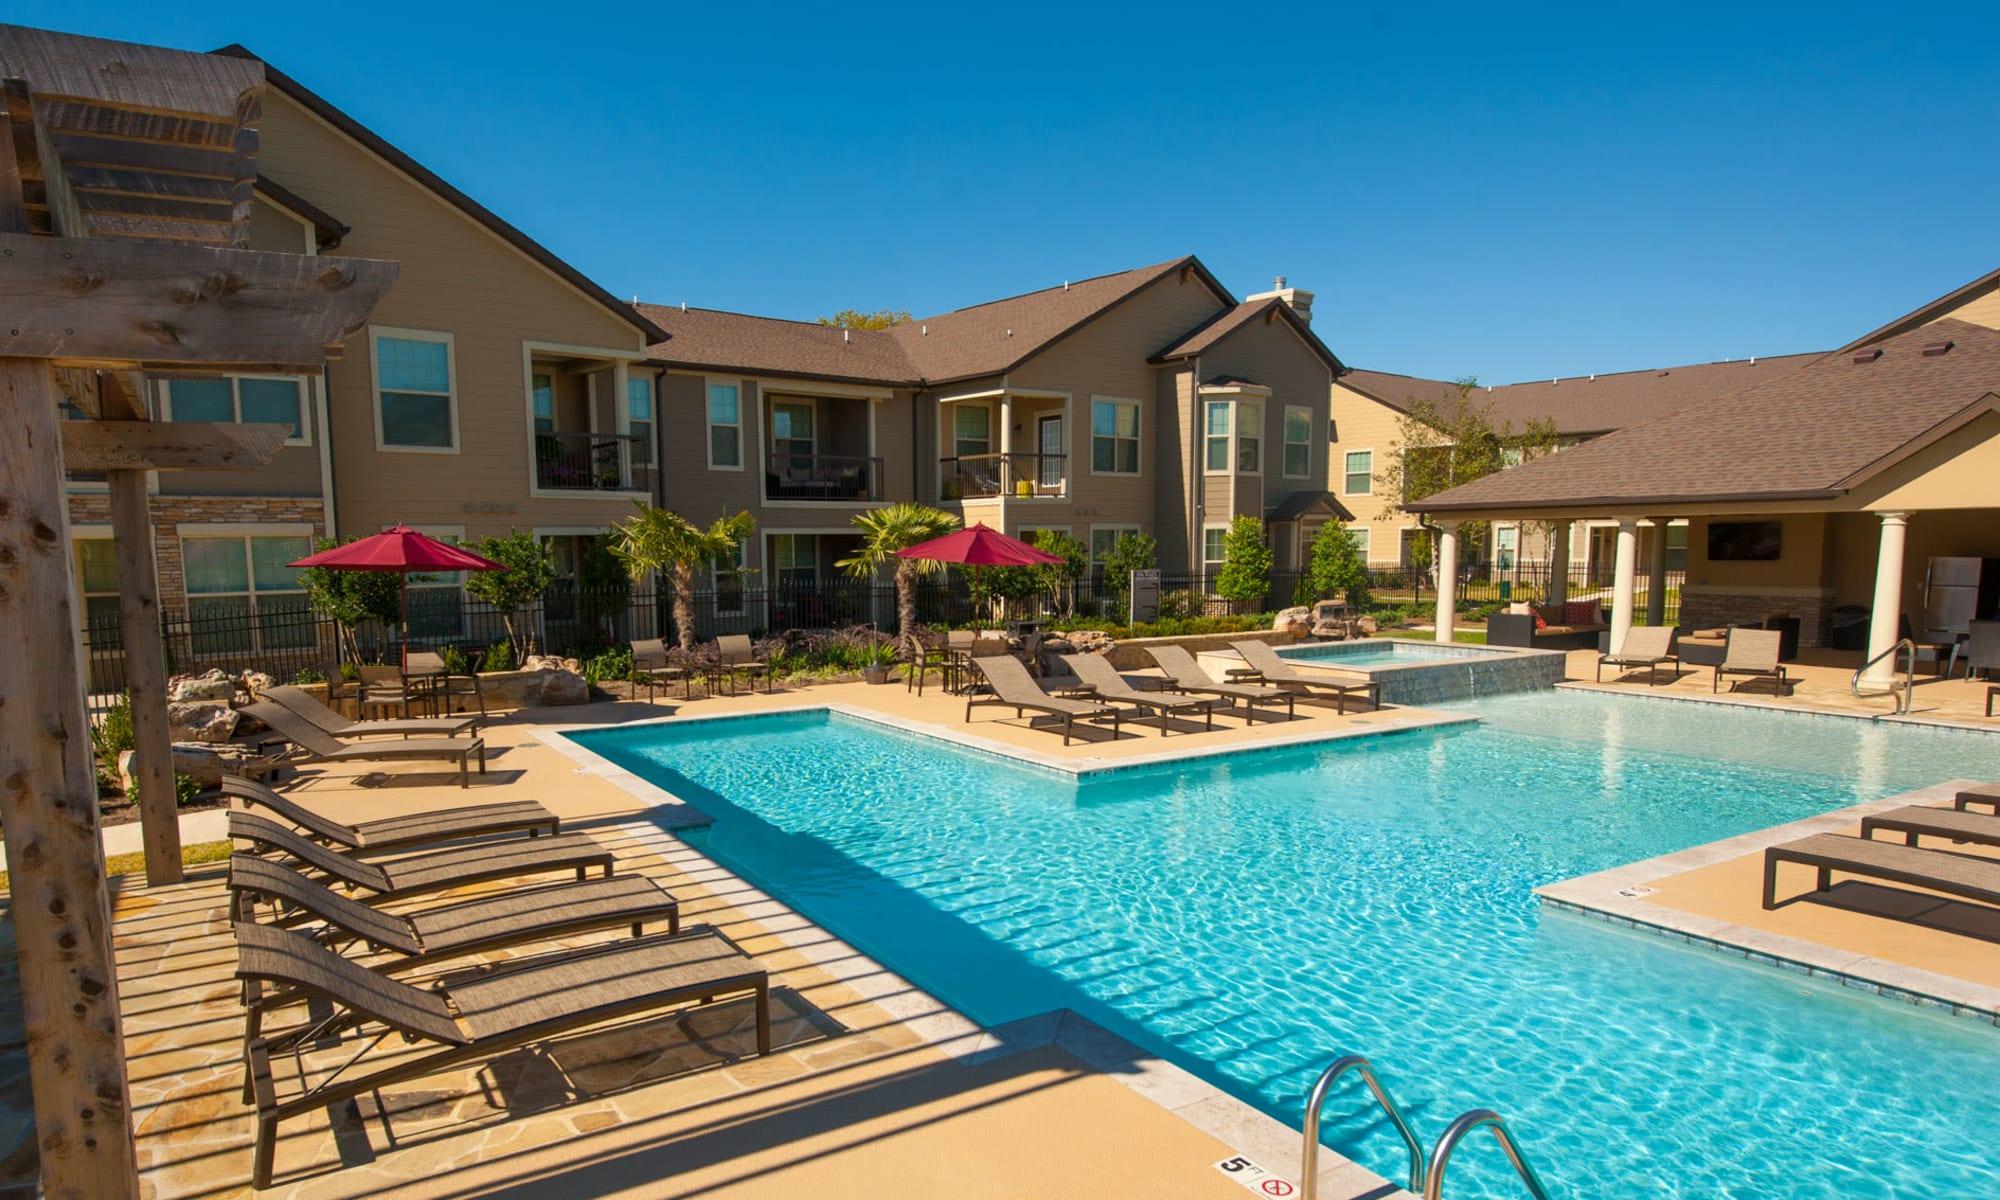 Apartments in Shreveport, LA